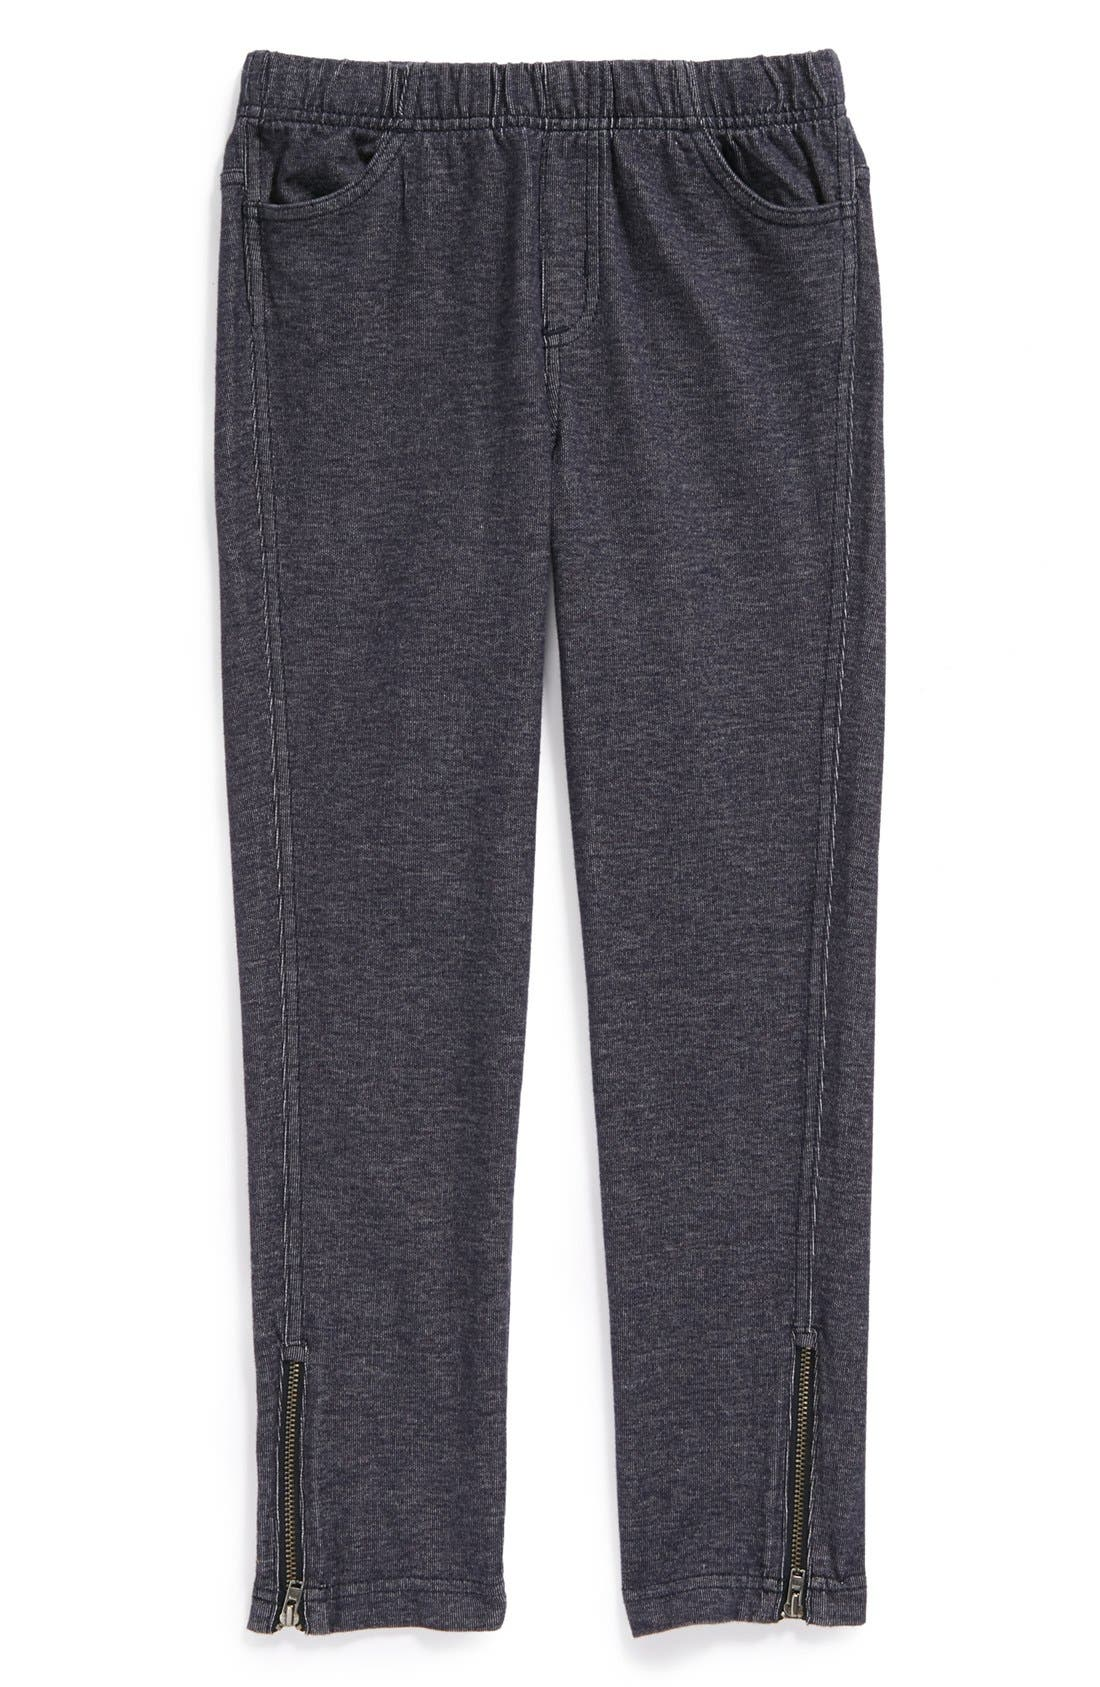 Alternate Image 1 Selected - Tea Collection Knit Skinny Leg Pants (Little Girls & Big Girls)